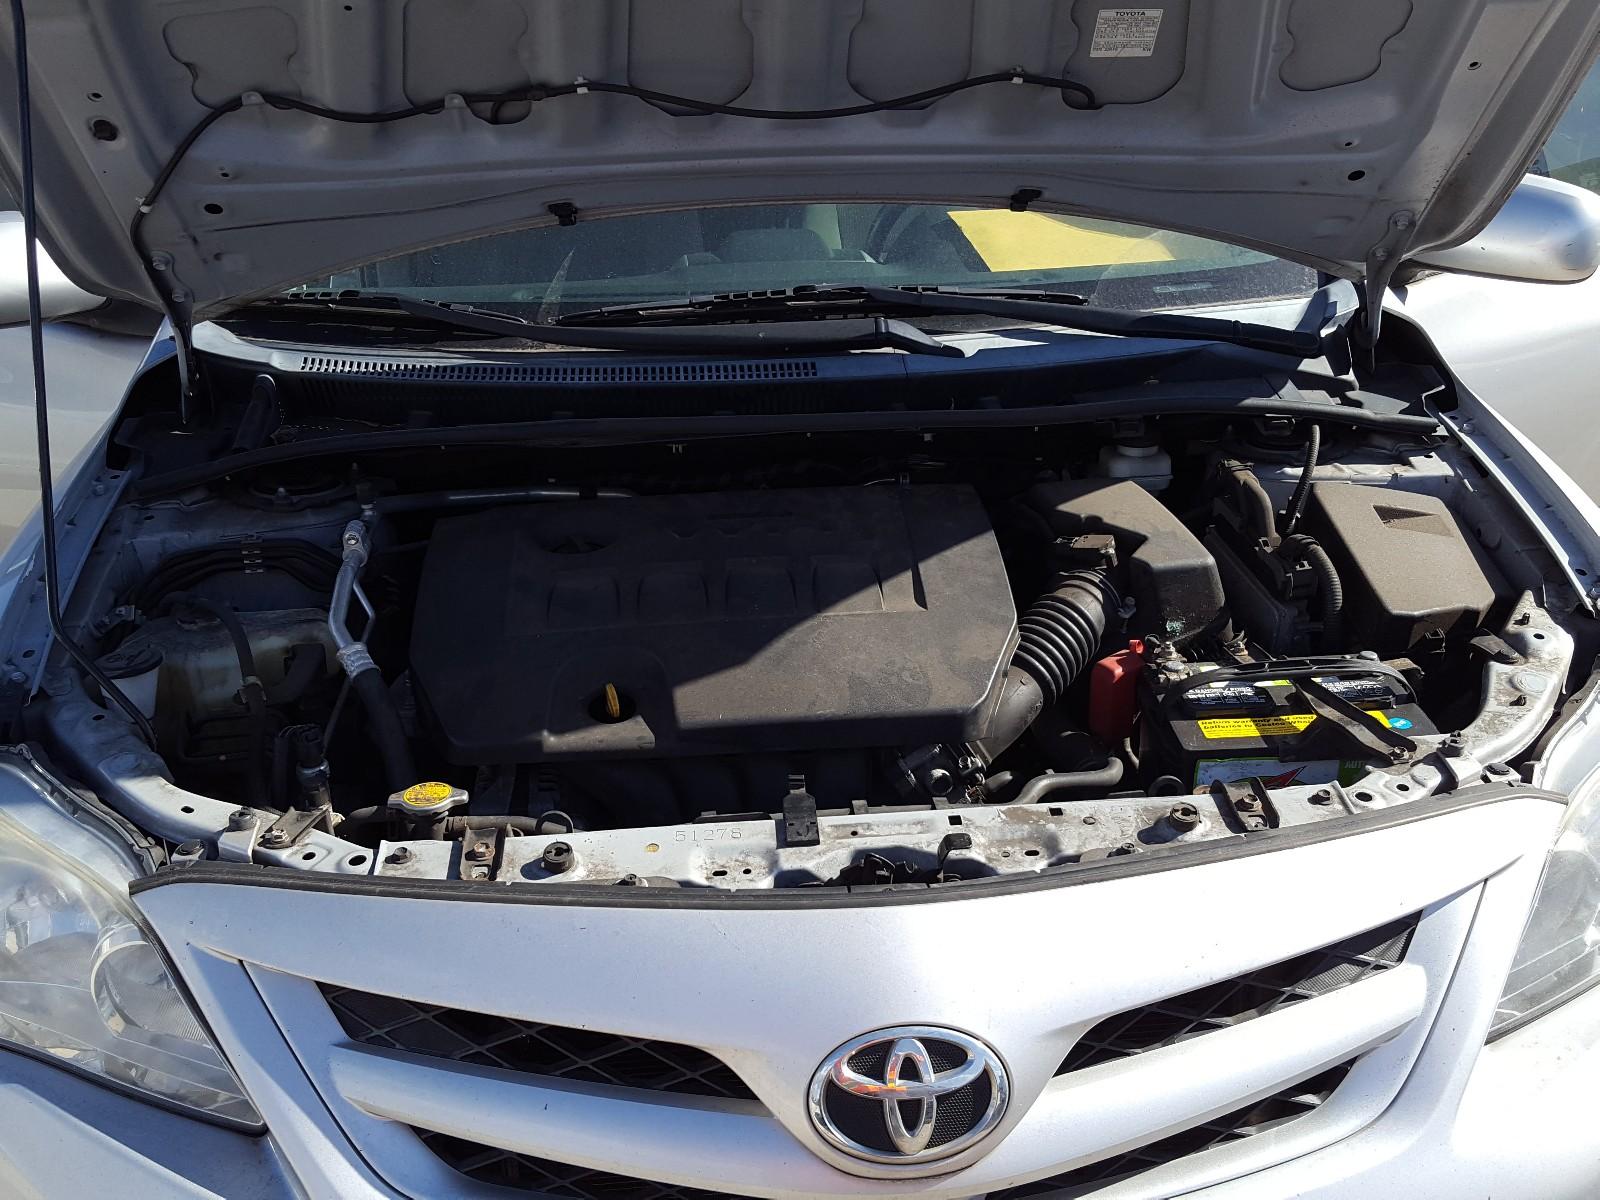 2T1BU4EE0CC763011 - 2012 Toyota Corolla Ba 1.8L inside view